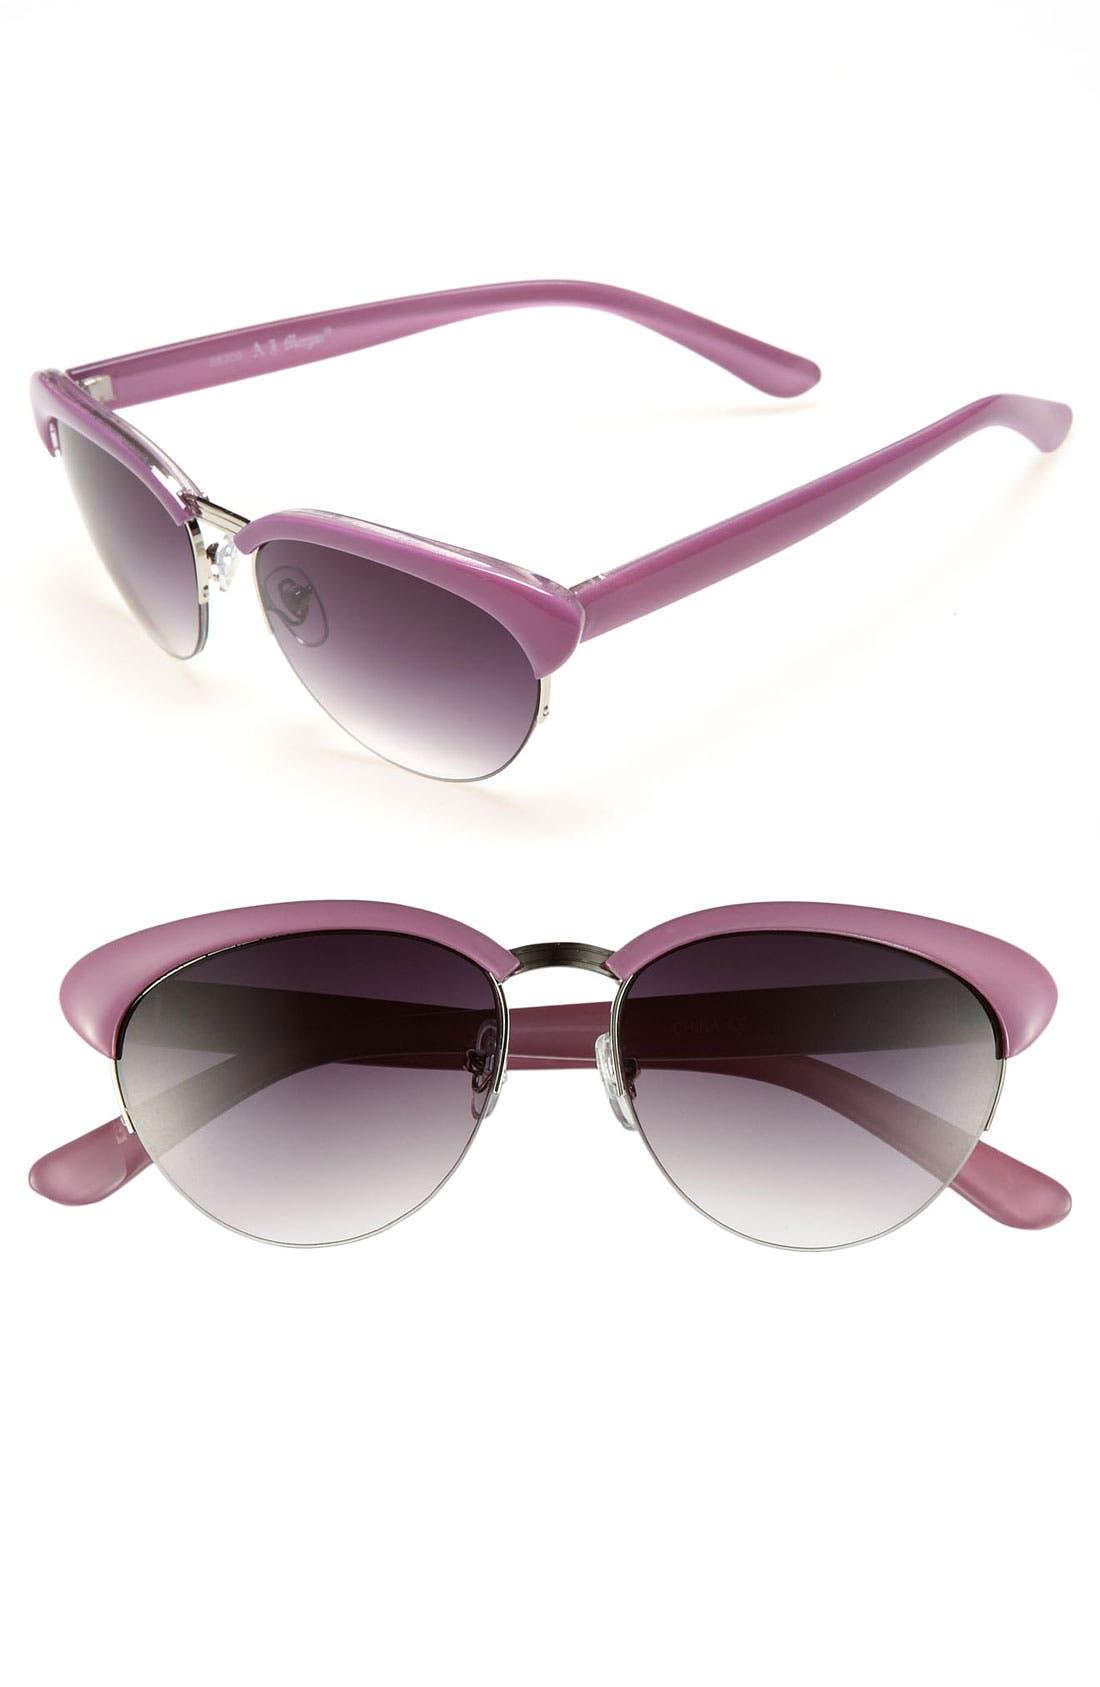 Main Image - A.J. Morgan 'Cupcake' Sunglasses